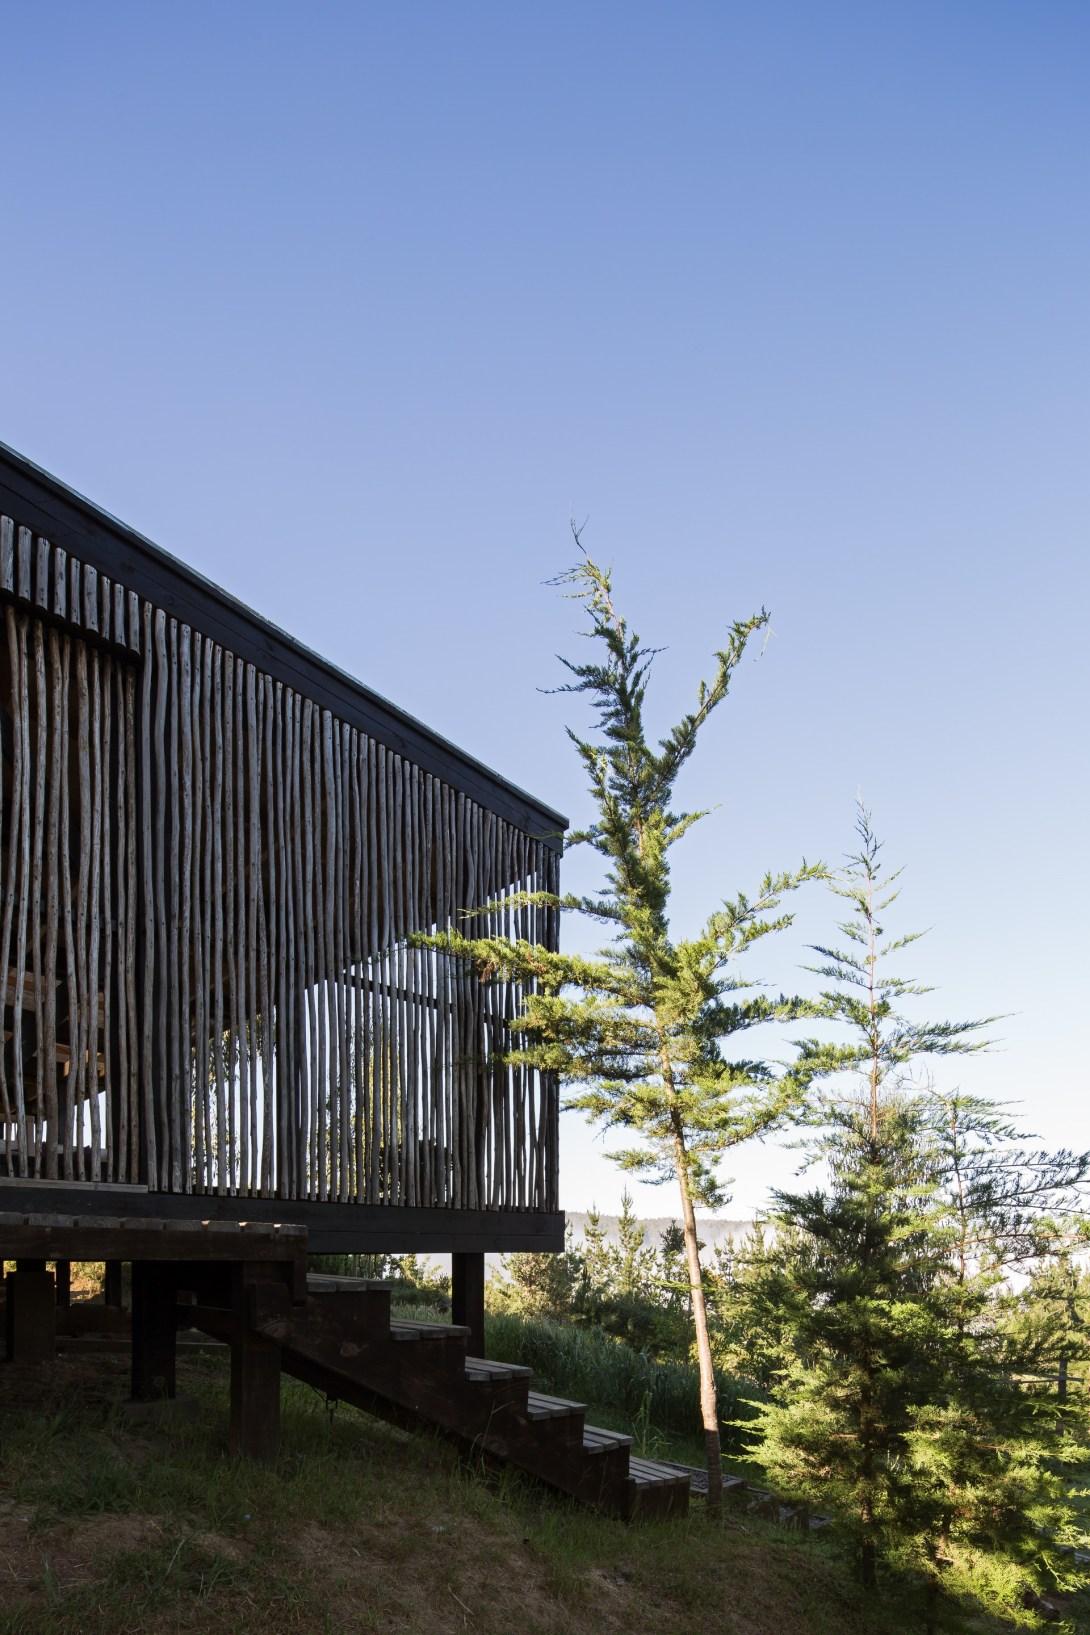 Casa en Tuman - Johan Selbing & Alondra Vargas (3)